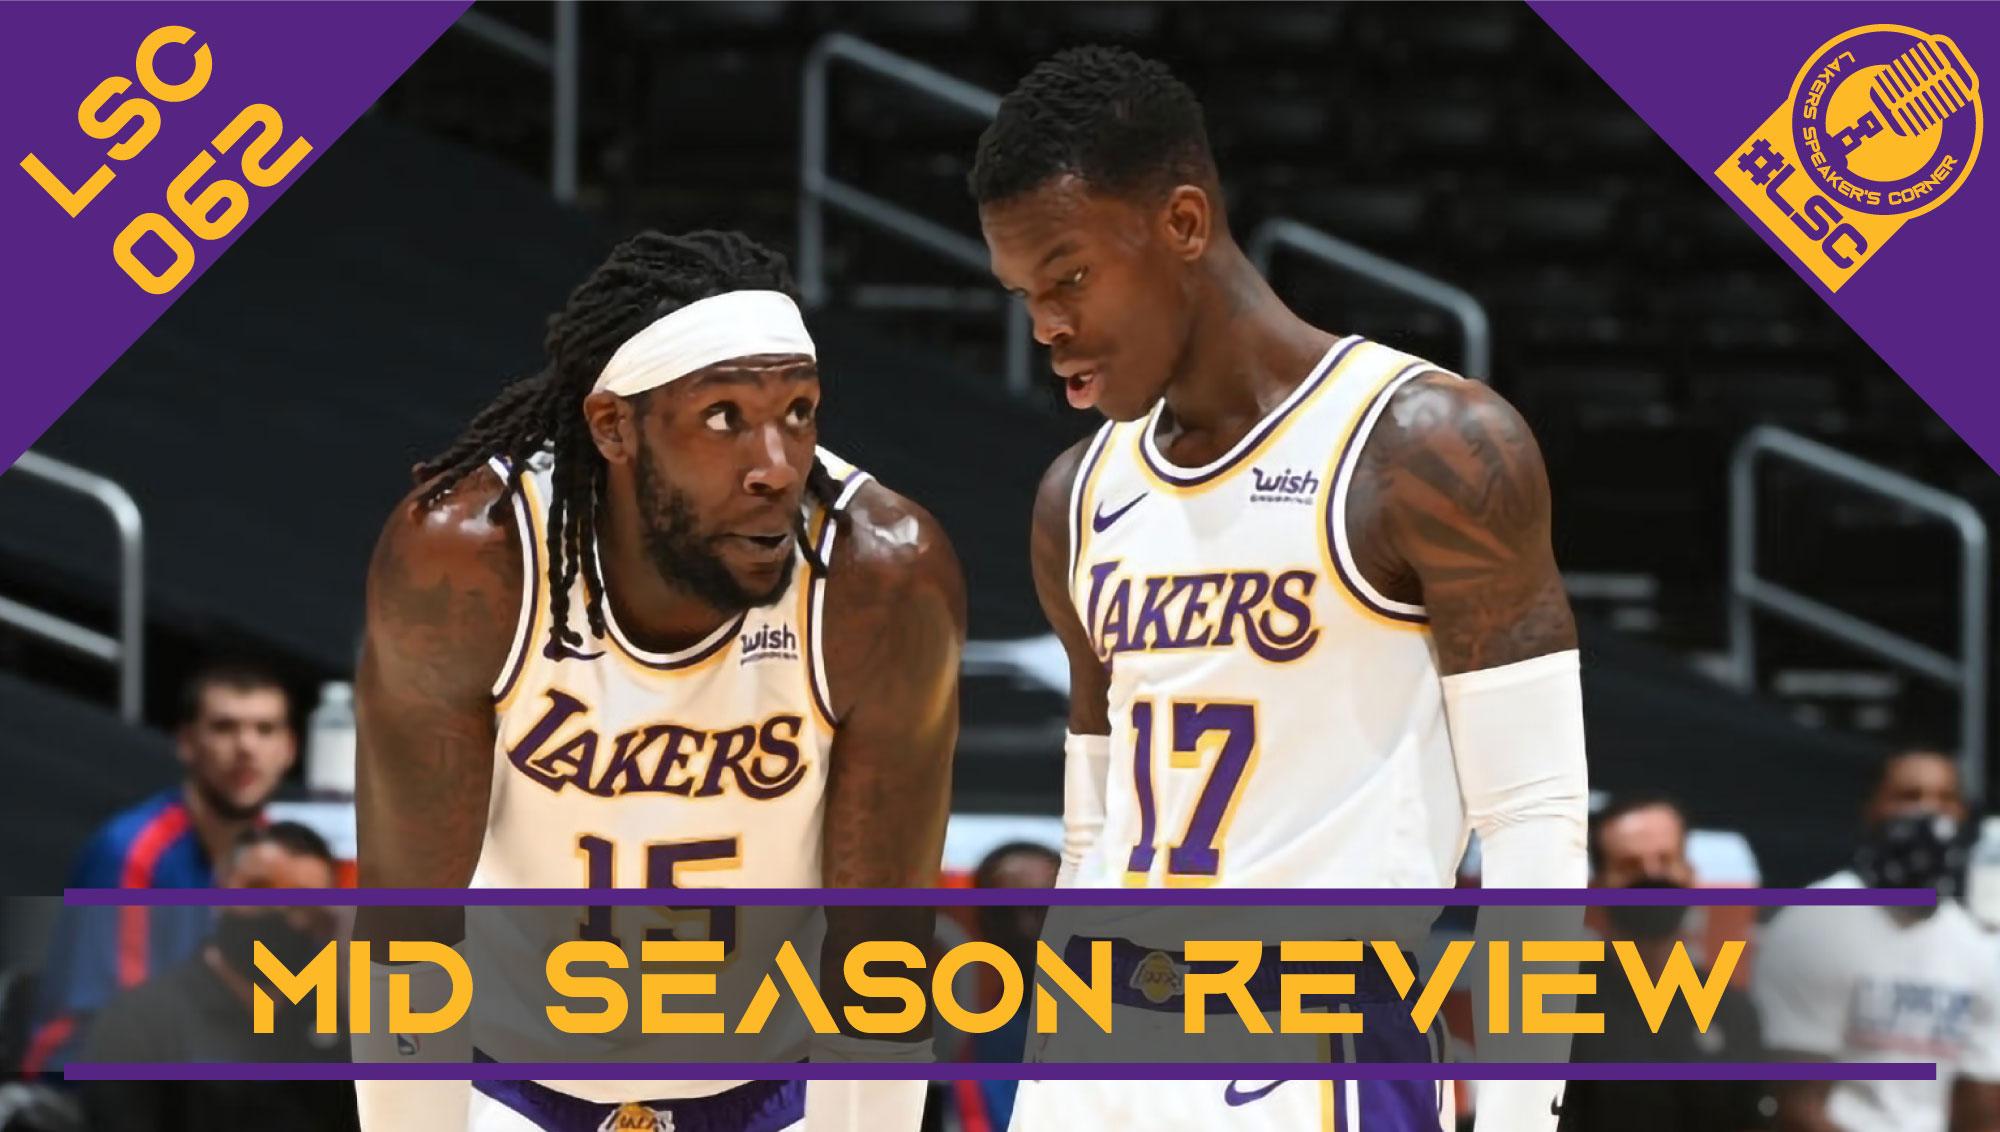 Mid Season Review